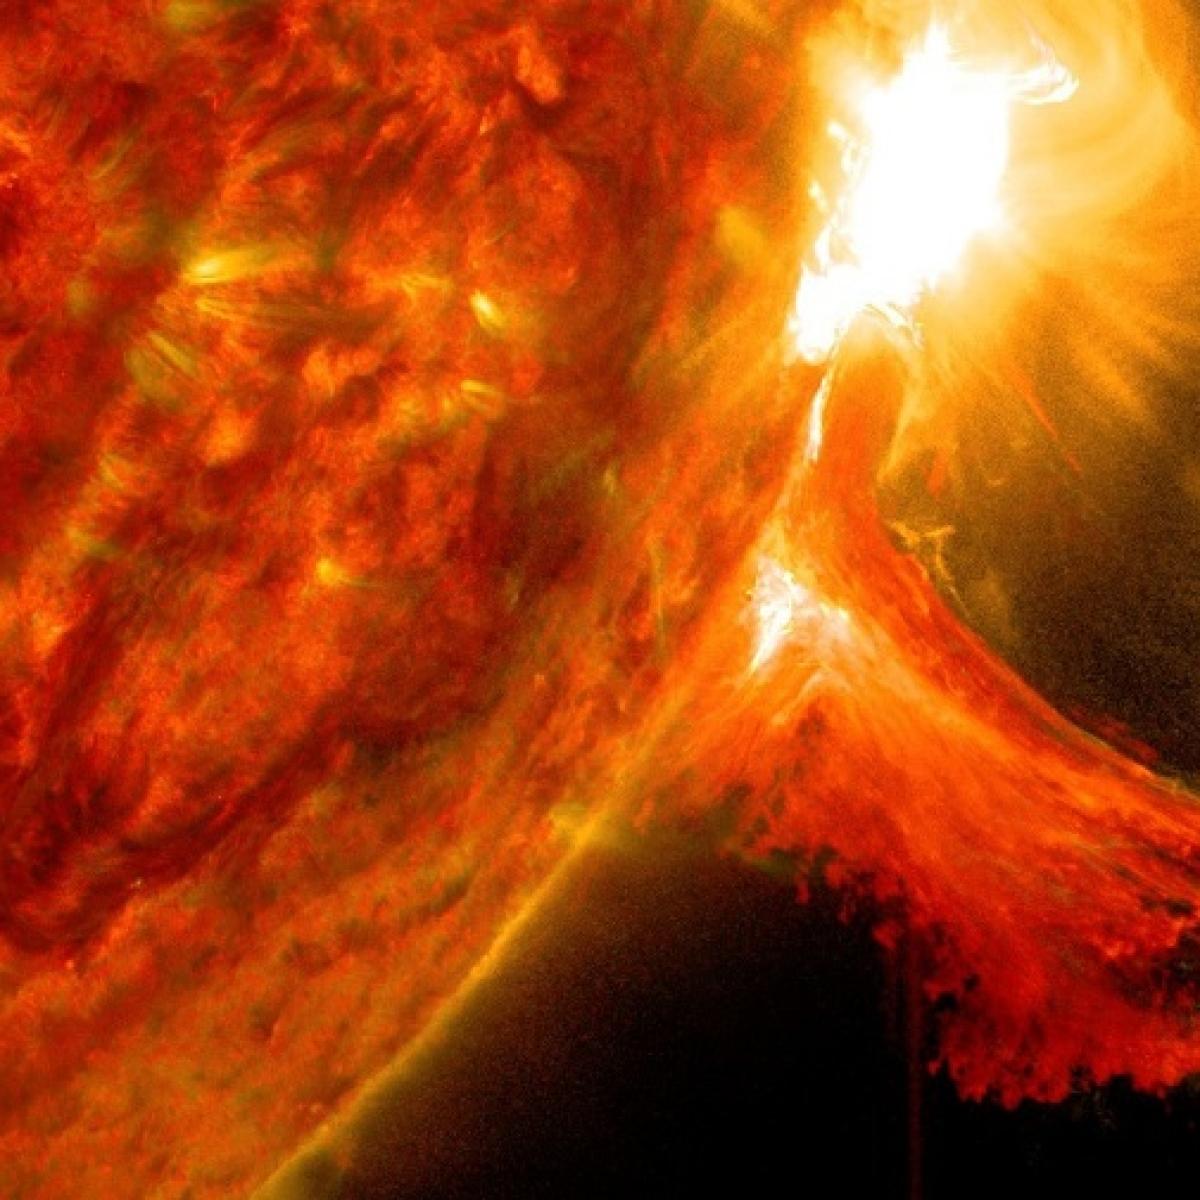 NASA-European Space Agency's sun-watching spacecraft captures first solar eruption